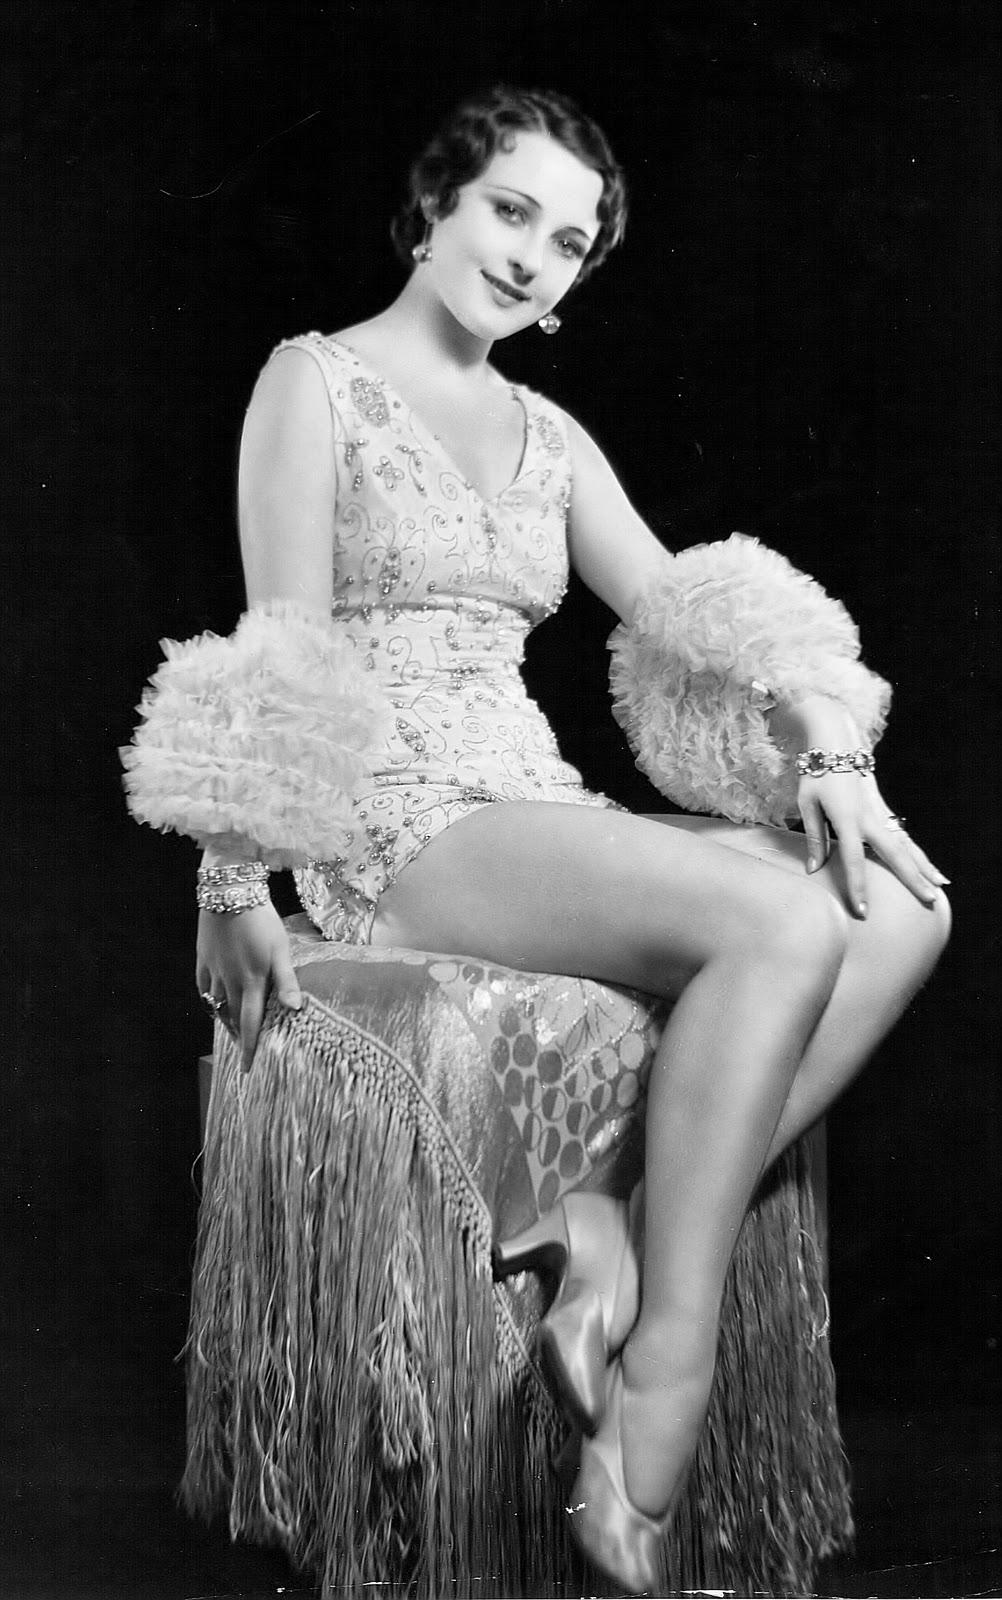 Miriam Seegar,Rosemary Radcliffe Adult picture Richard Beckinsale (1947?979),Joy Enriquez